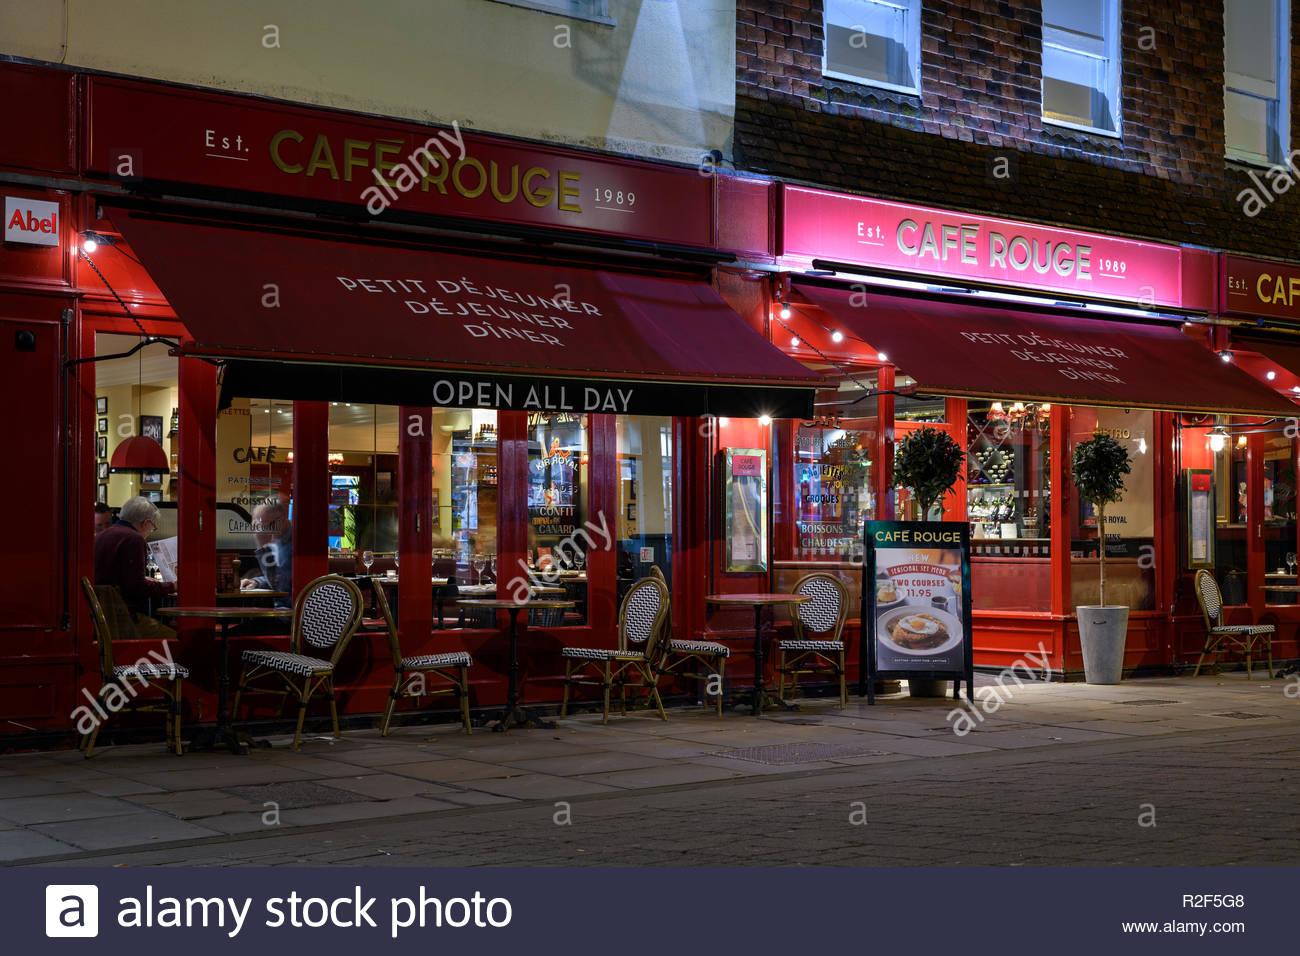 Cafe Rouge, High Street, Salisbury, Wiltshire, England, UK - Stock Image